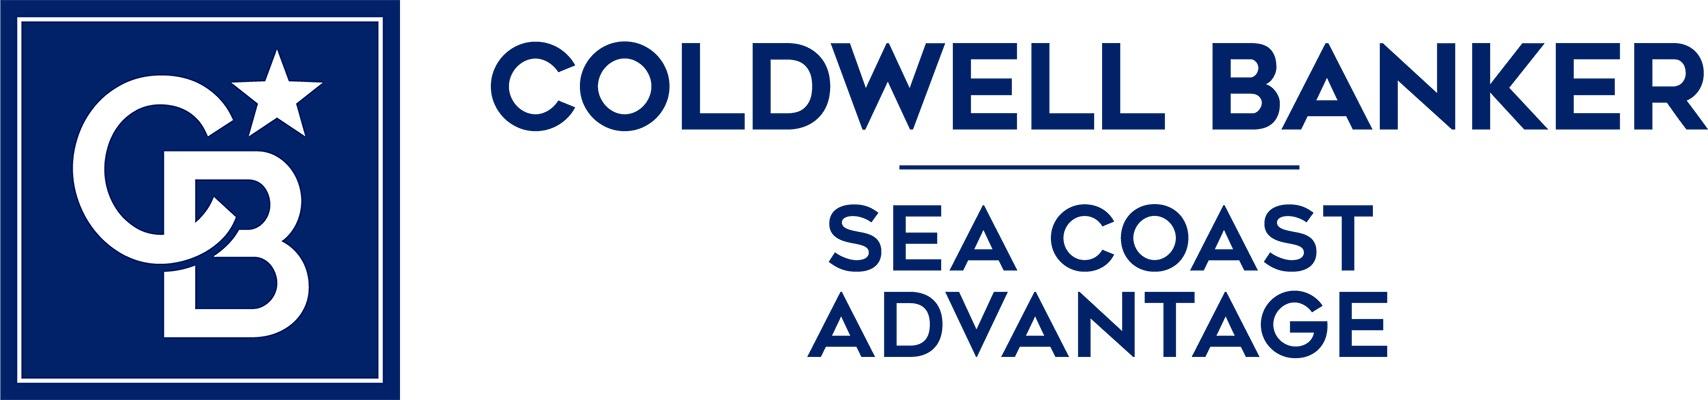 Ken Brandon - Coldwell Banker Sea Coast Advantage Realty Logo